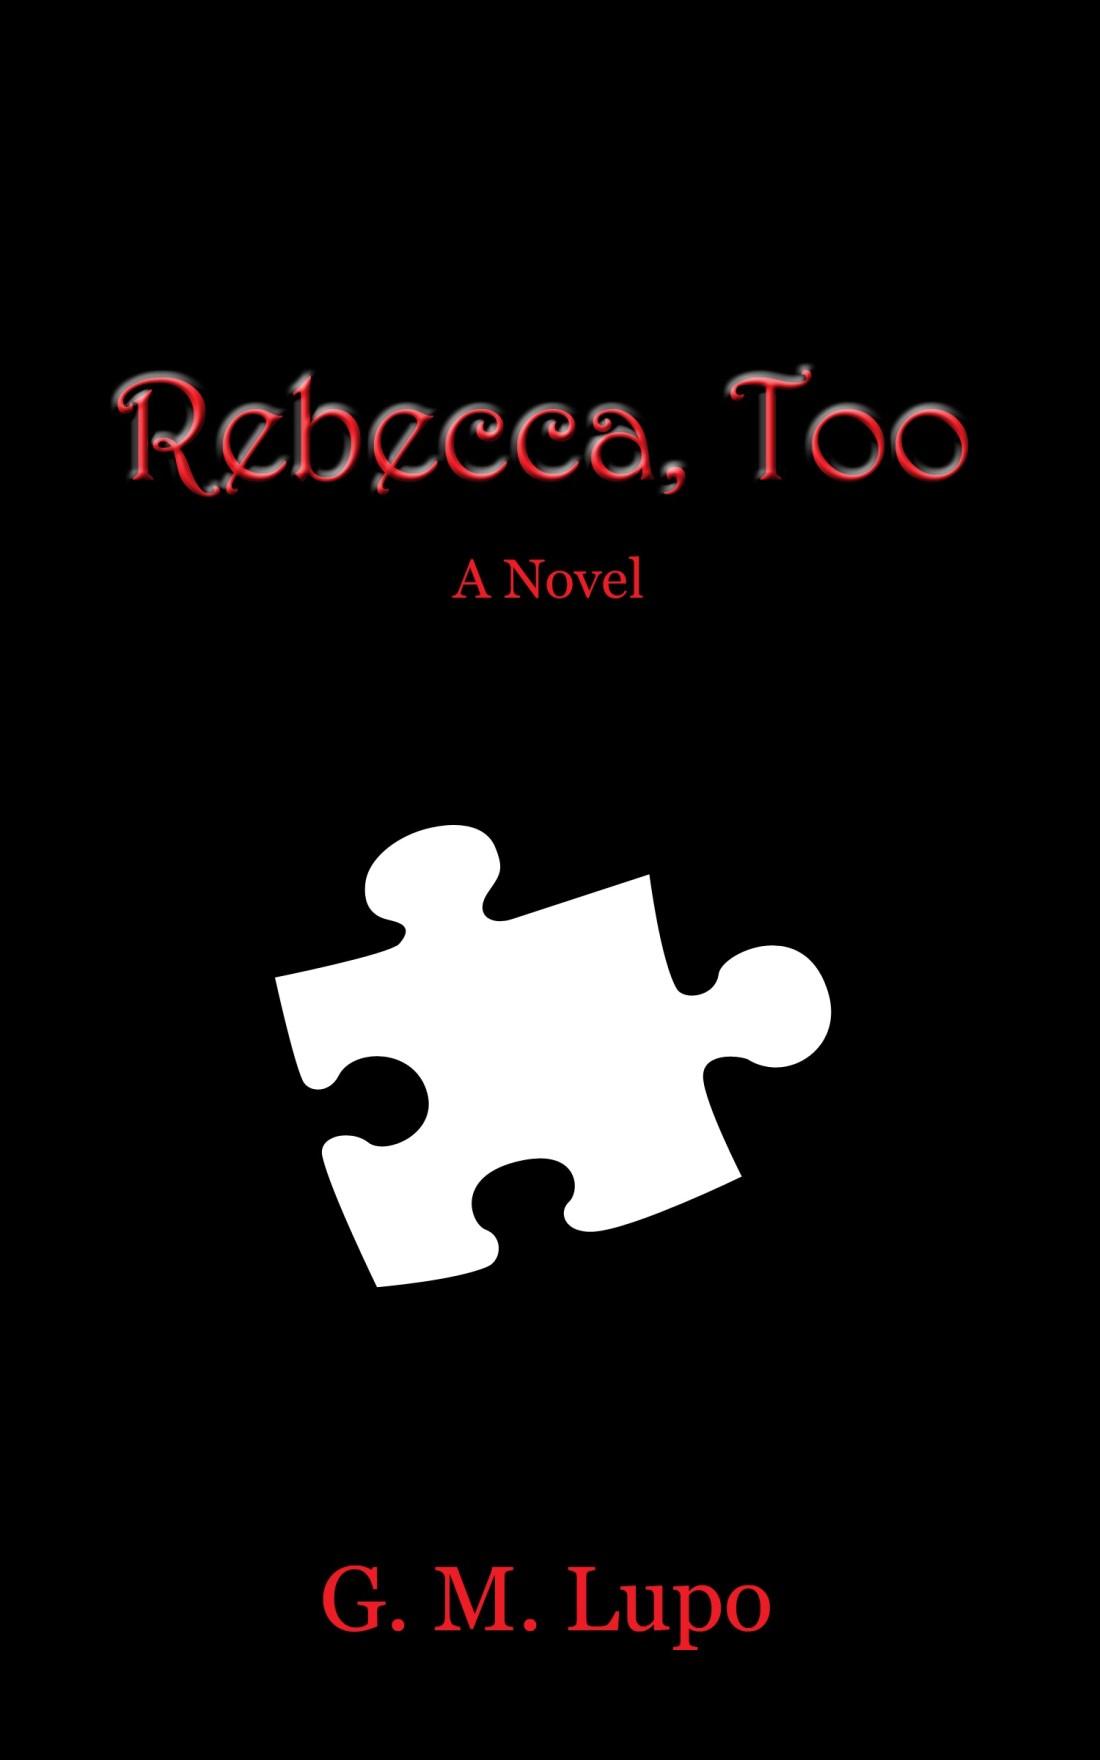 Rebecca, Too Cover Image